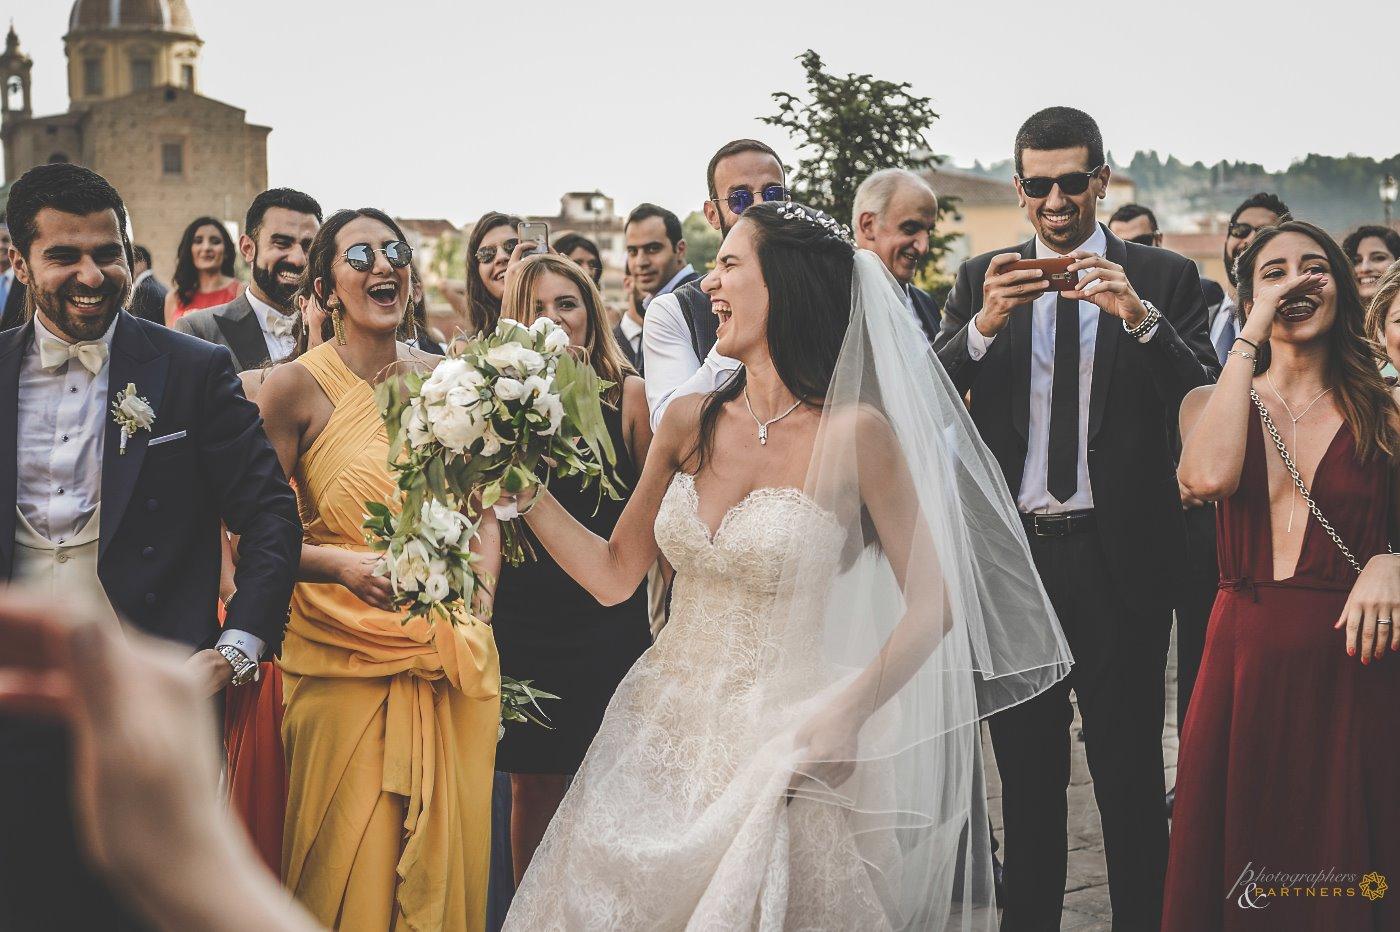 photography_weddings_florence_11.jpg